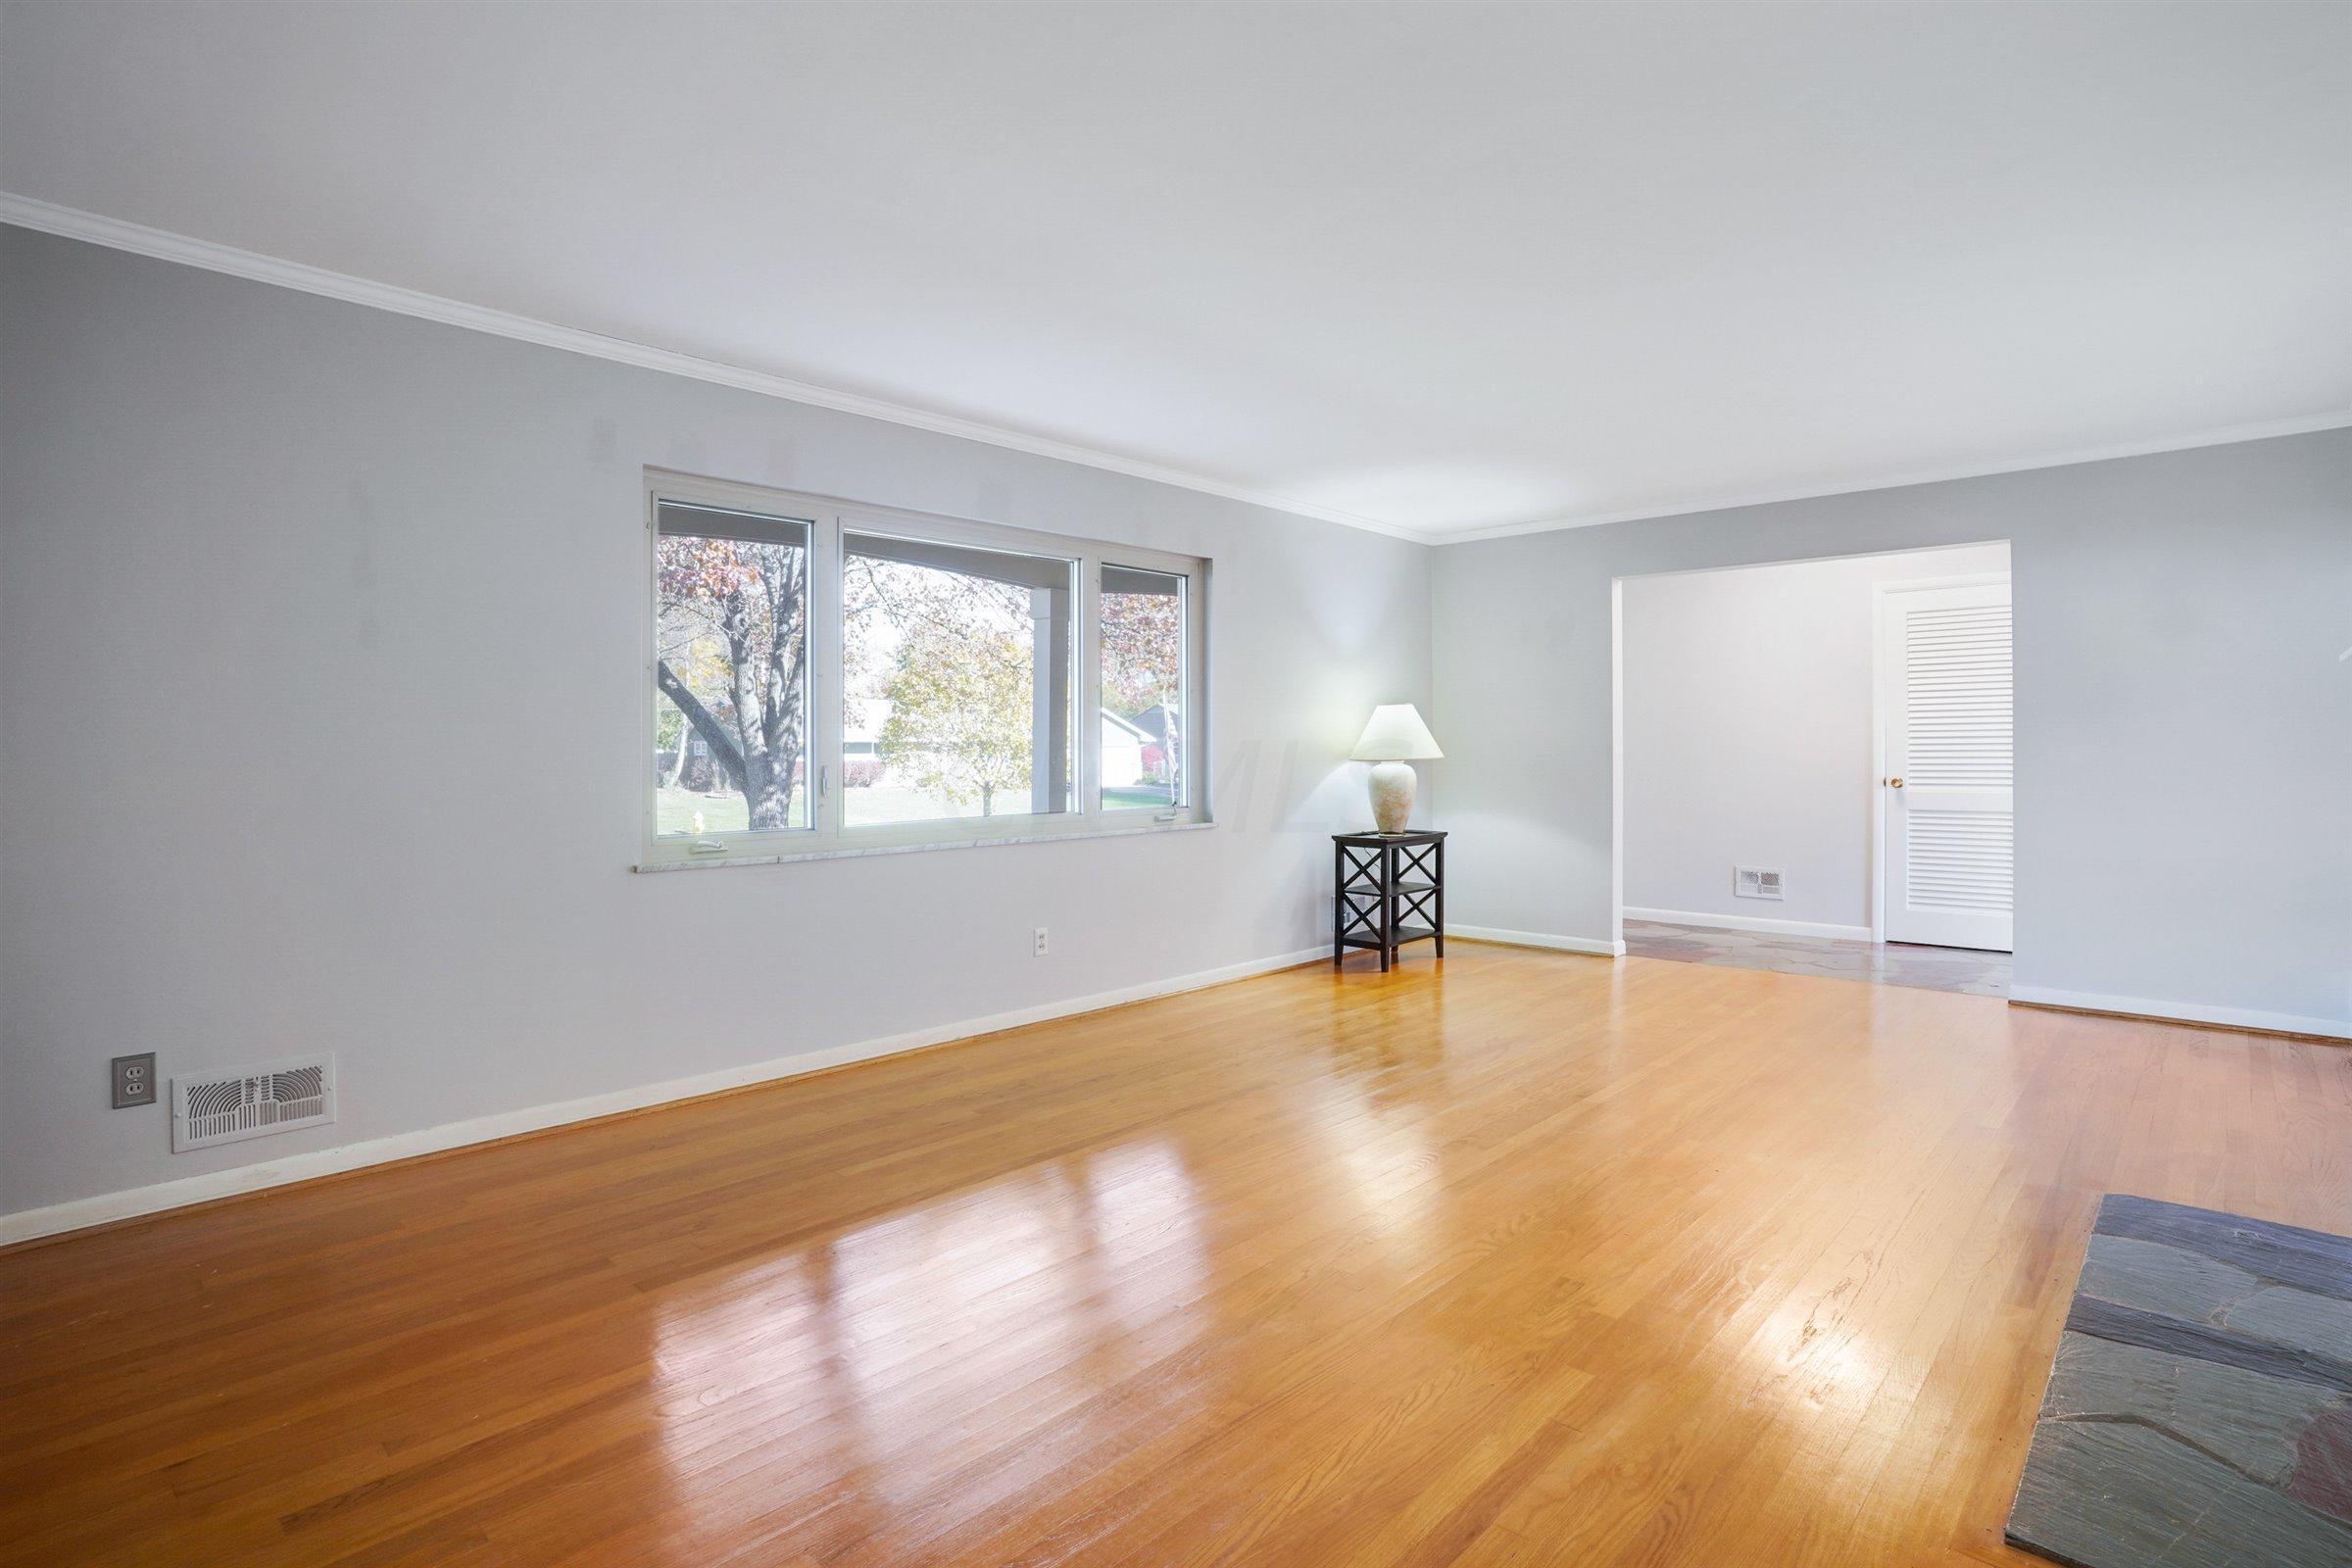 2105 Chardon Road, Columbus, Ohio 43220, 3 Bedrooms Bedrooms, ,2 BathroomsBathrooms,Residential,For Sale,Chardon,220039837